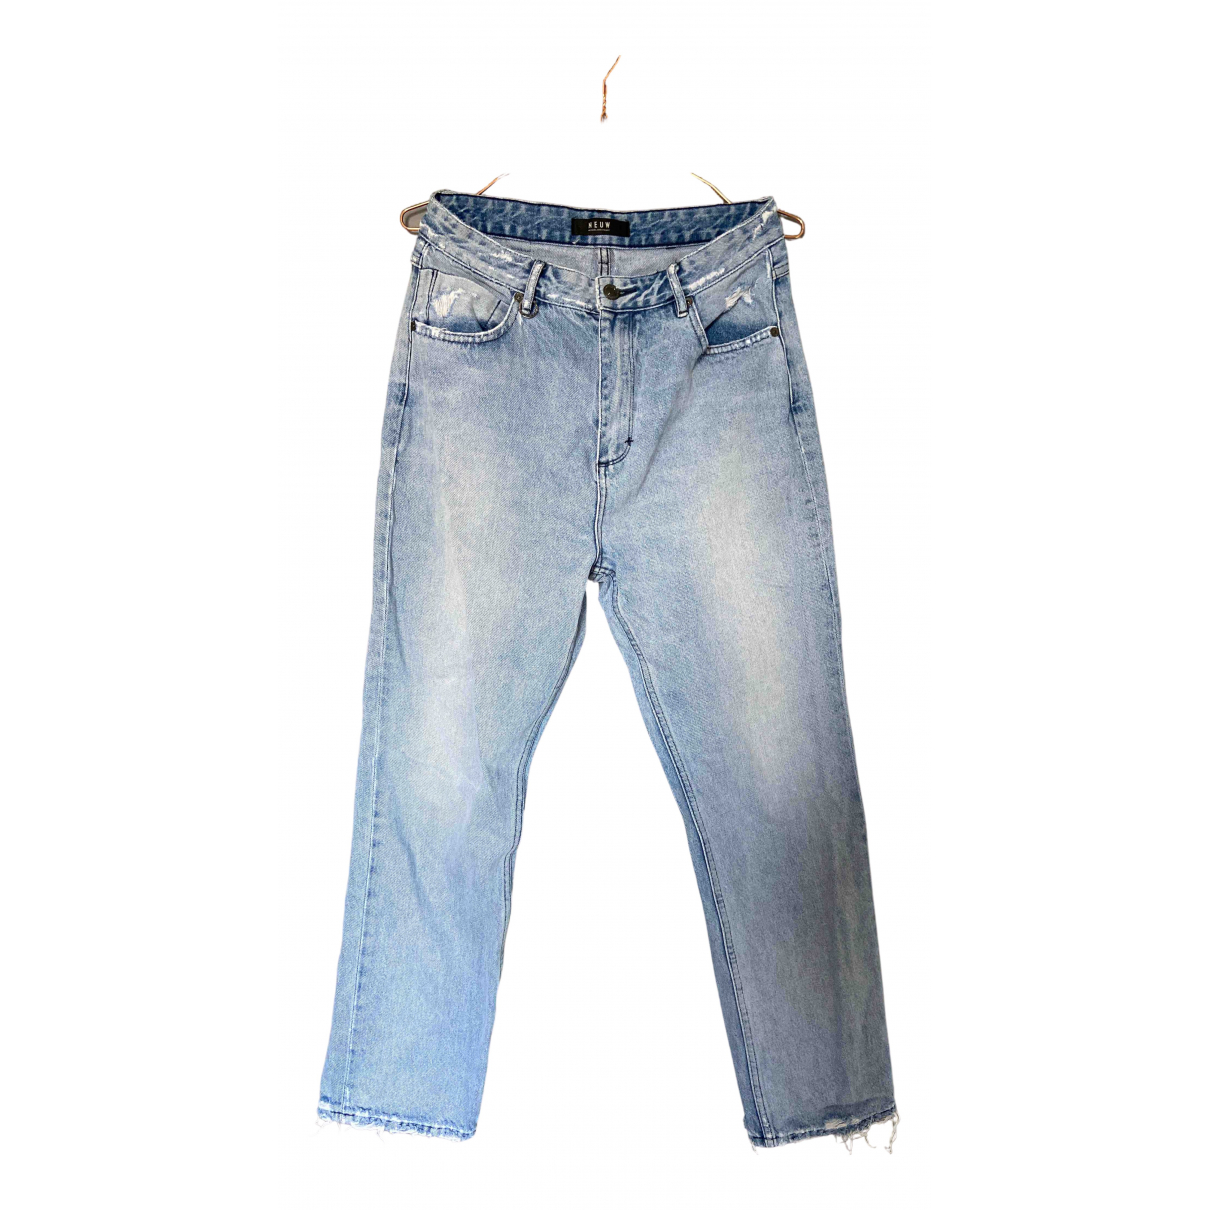 Neuw N Navy Denim - Jeans Jeans for Women 30 US